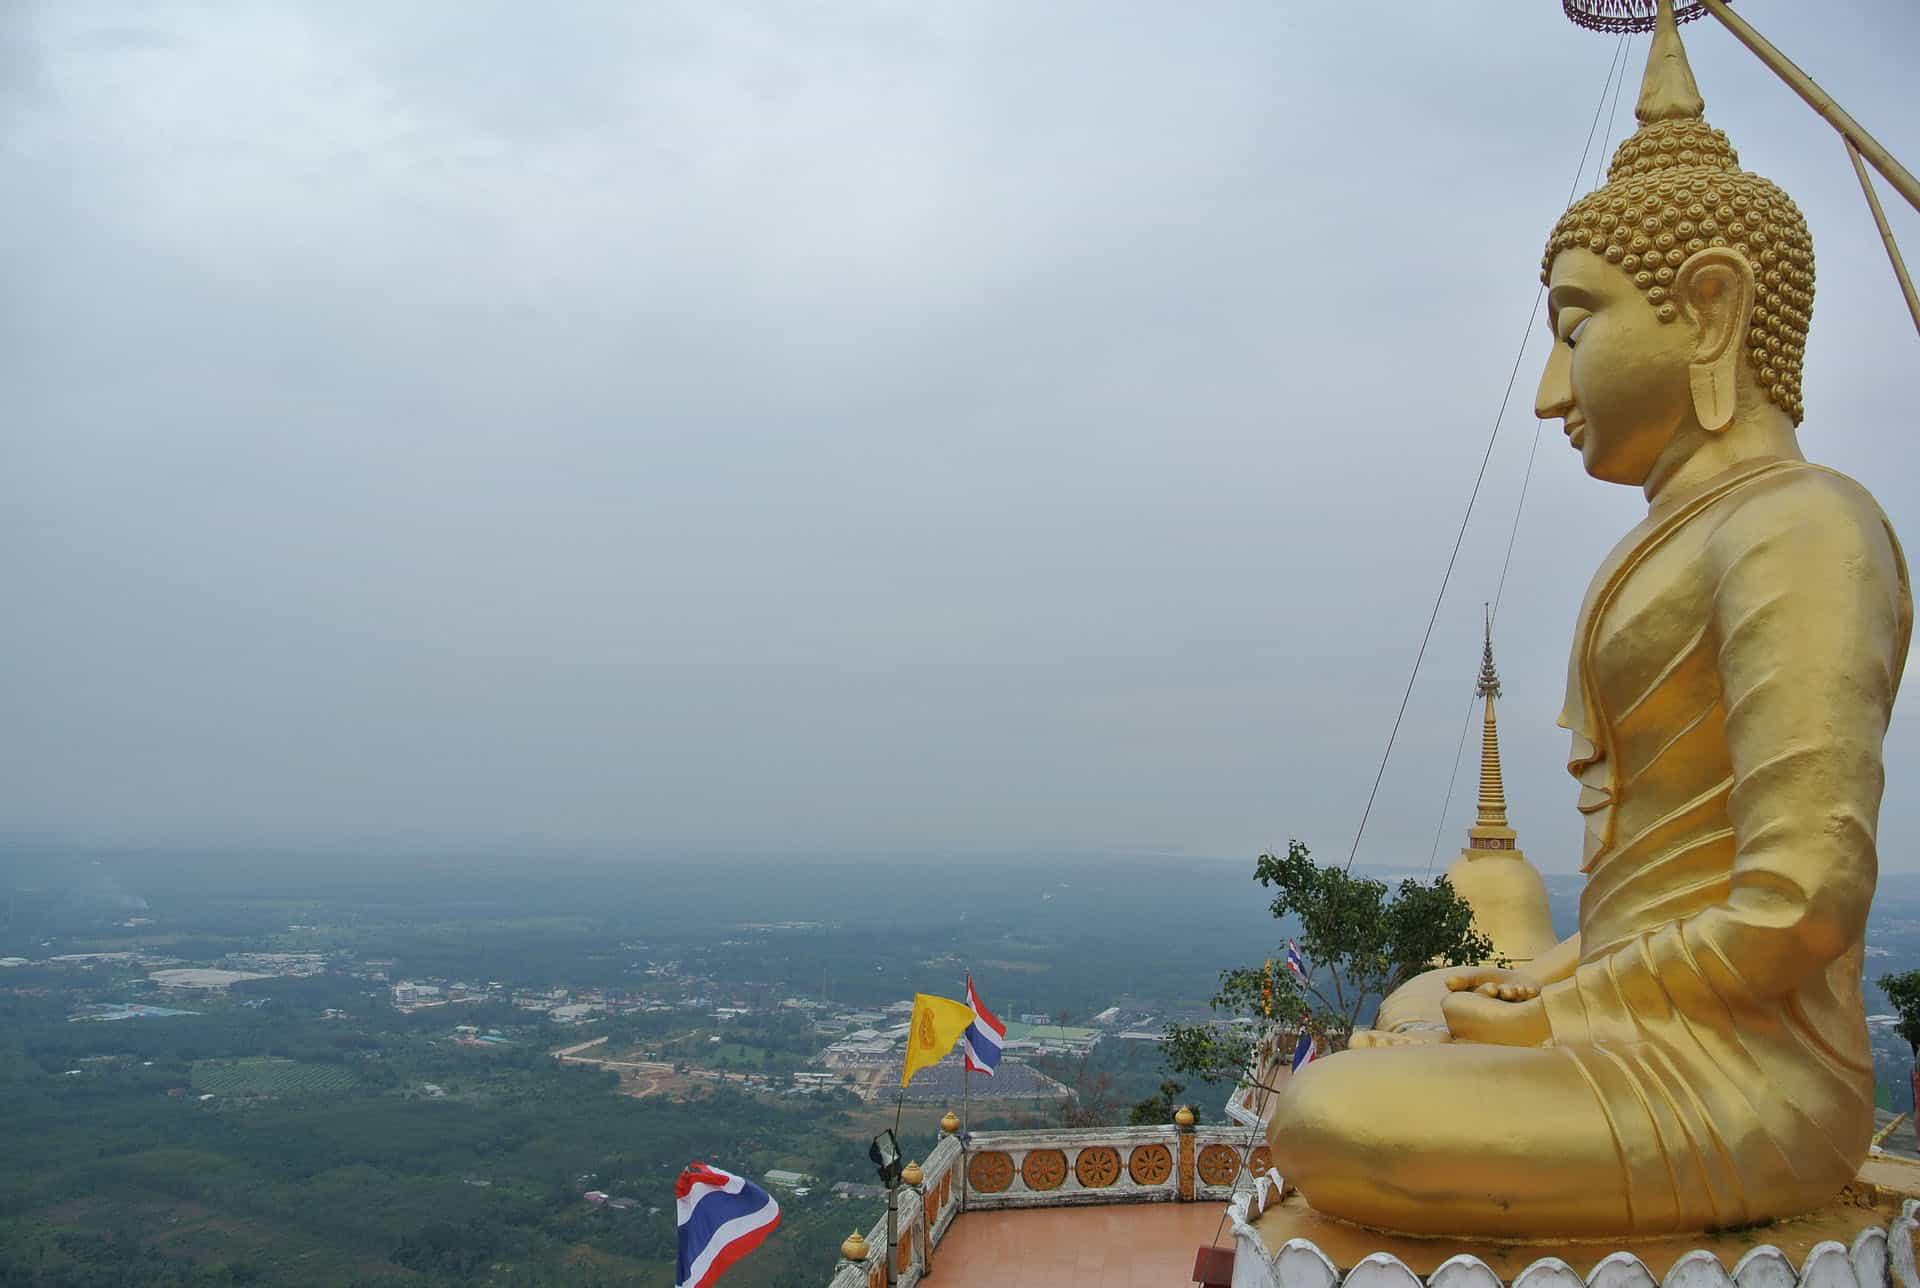 wat tham sua cave tiger temple in Krabi Thailand - pix